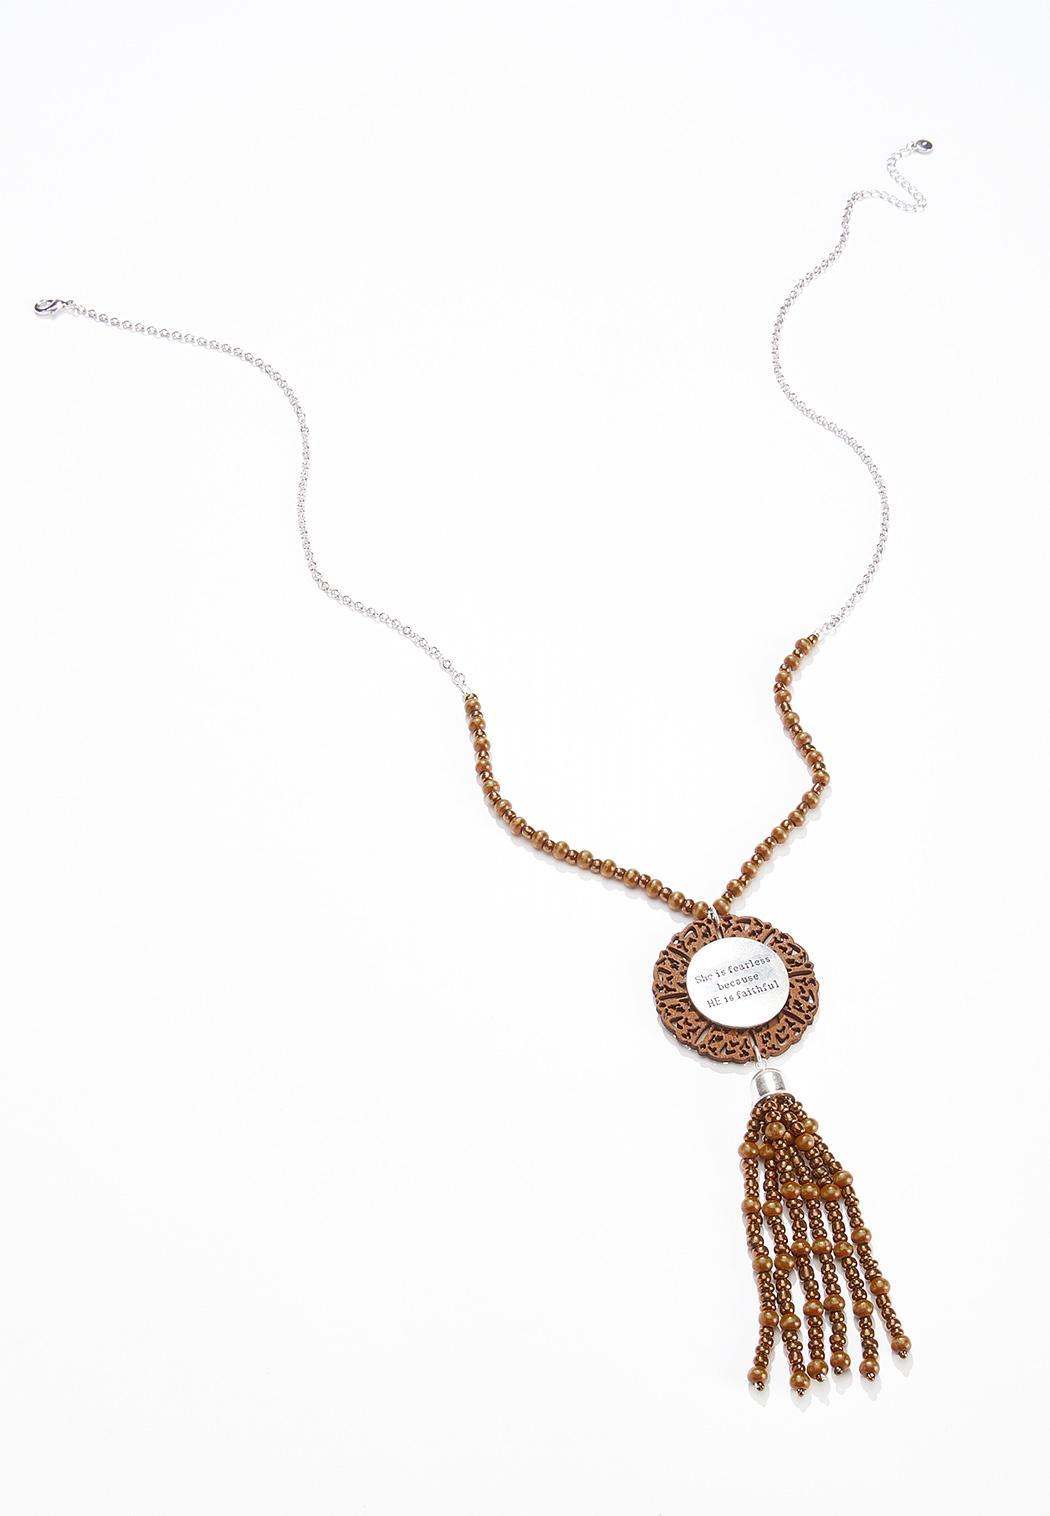 She Is Fearless Tassel Necklace